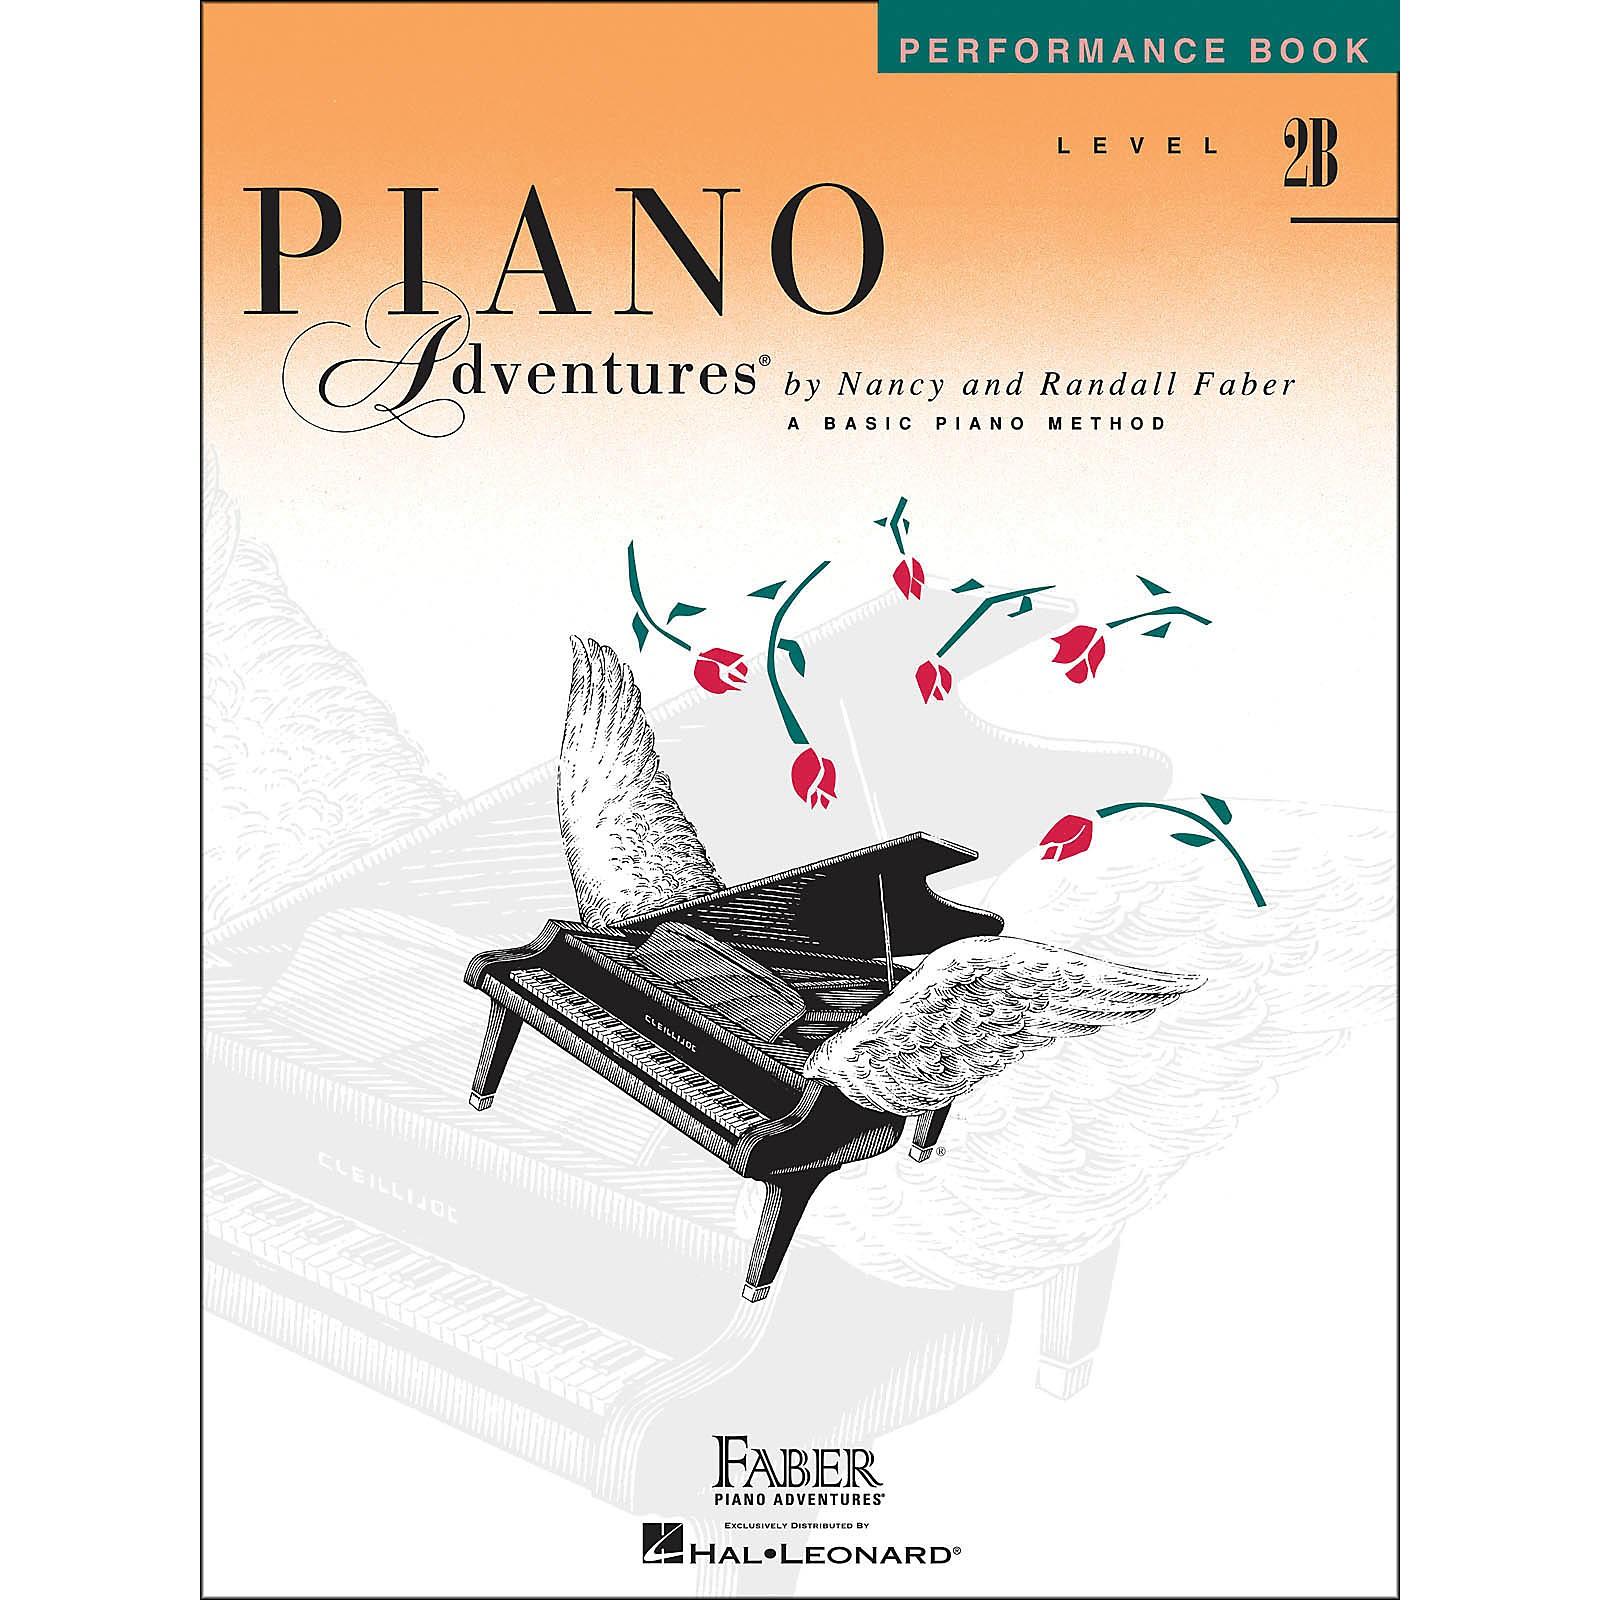 Faber Piano Adventures Piano Adventures Performance Book Level 2B